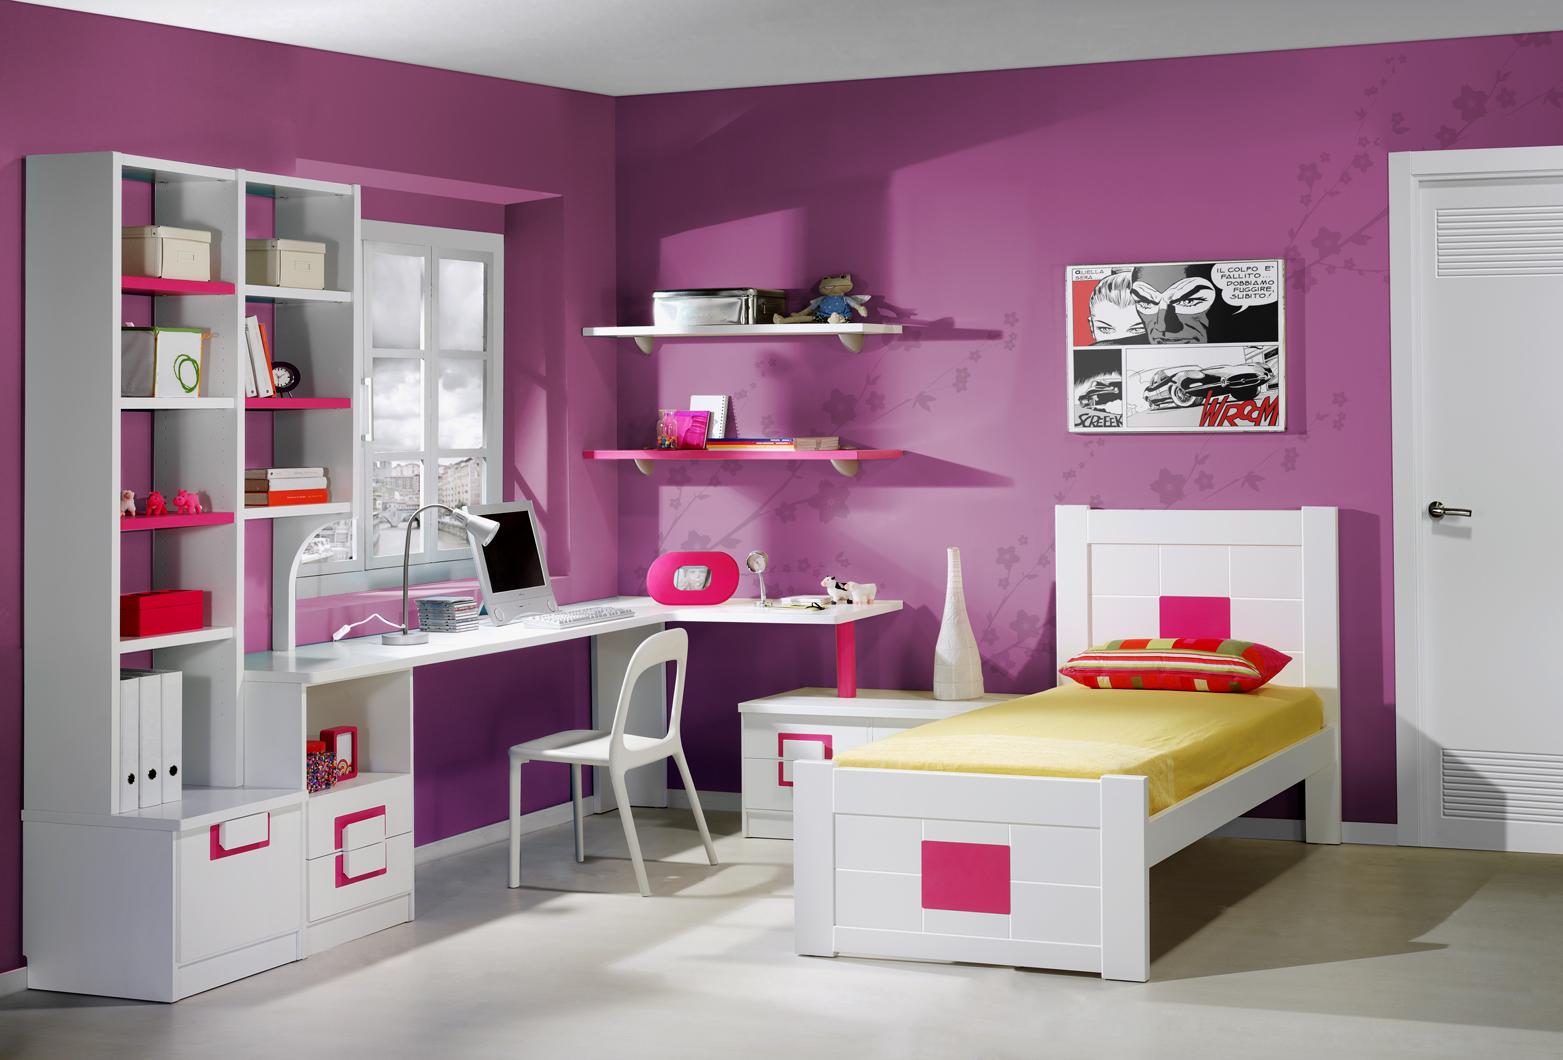 Dormitorios juveniles modernos para mujeres trendy for Disenos de cuartos para ninas adolescentes